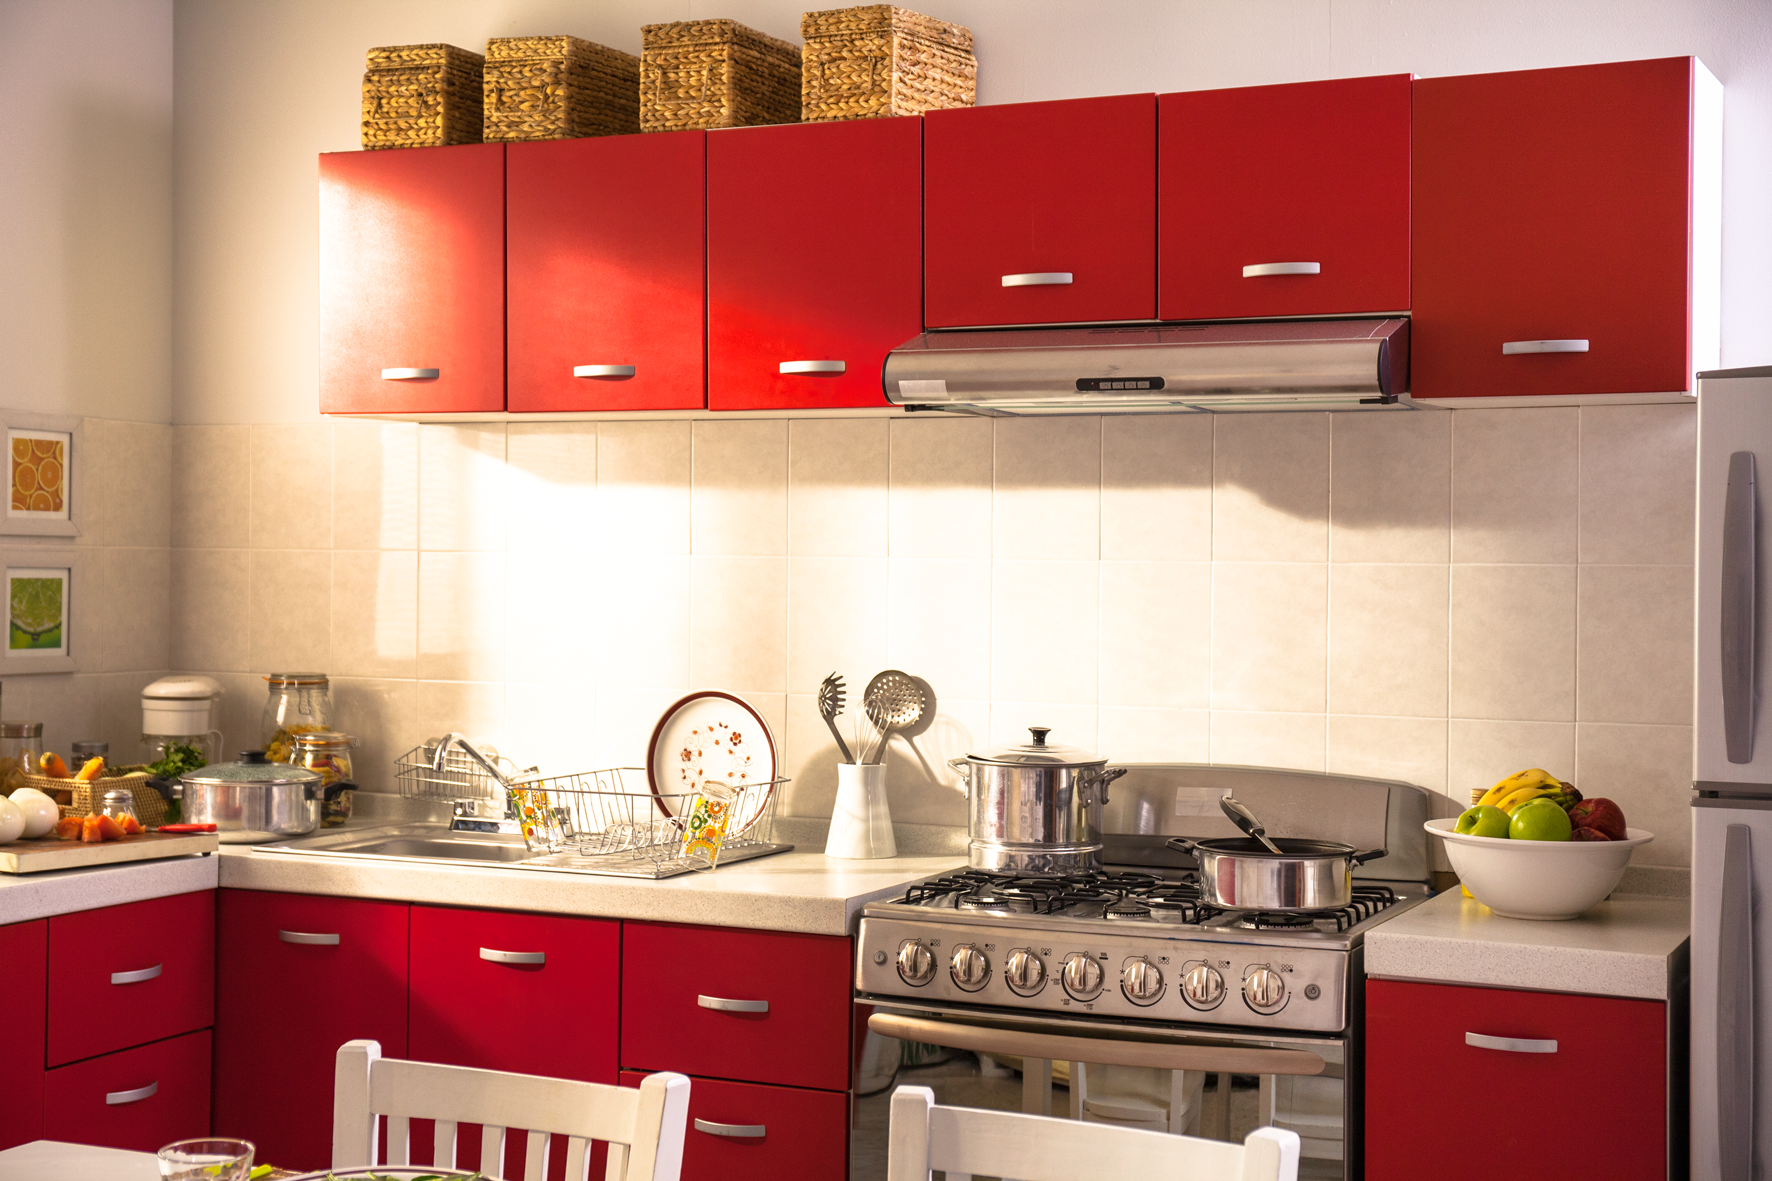 Paquete de cocina roja 2.40 m | Red kitchen, Ideas para and Kitchens